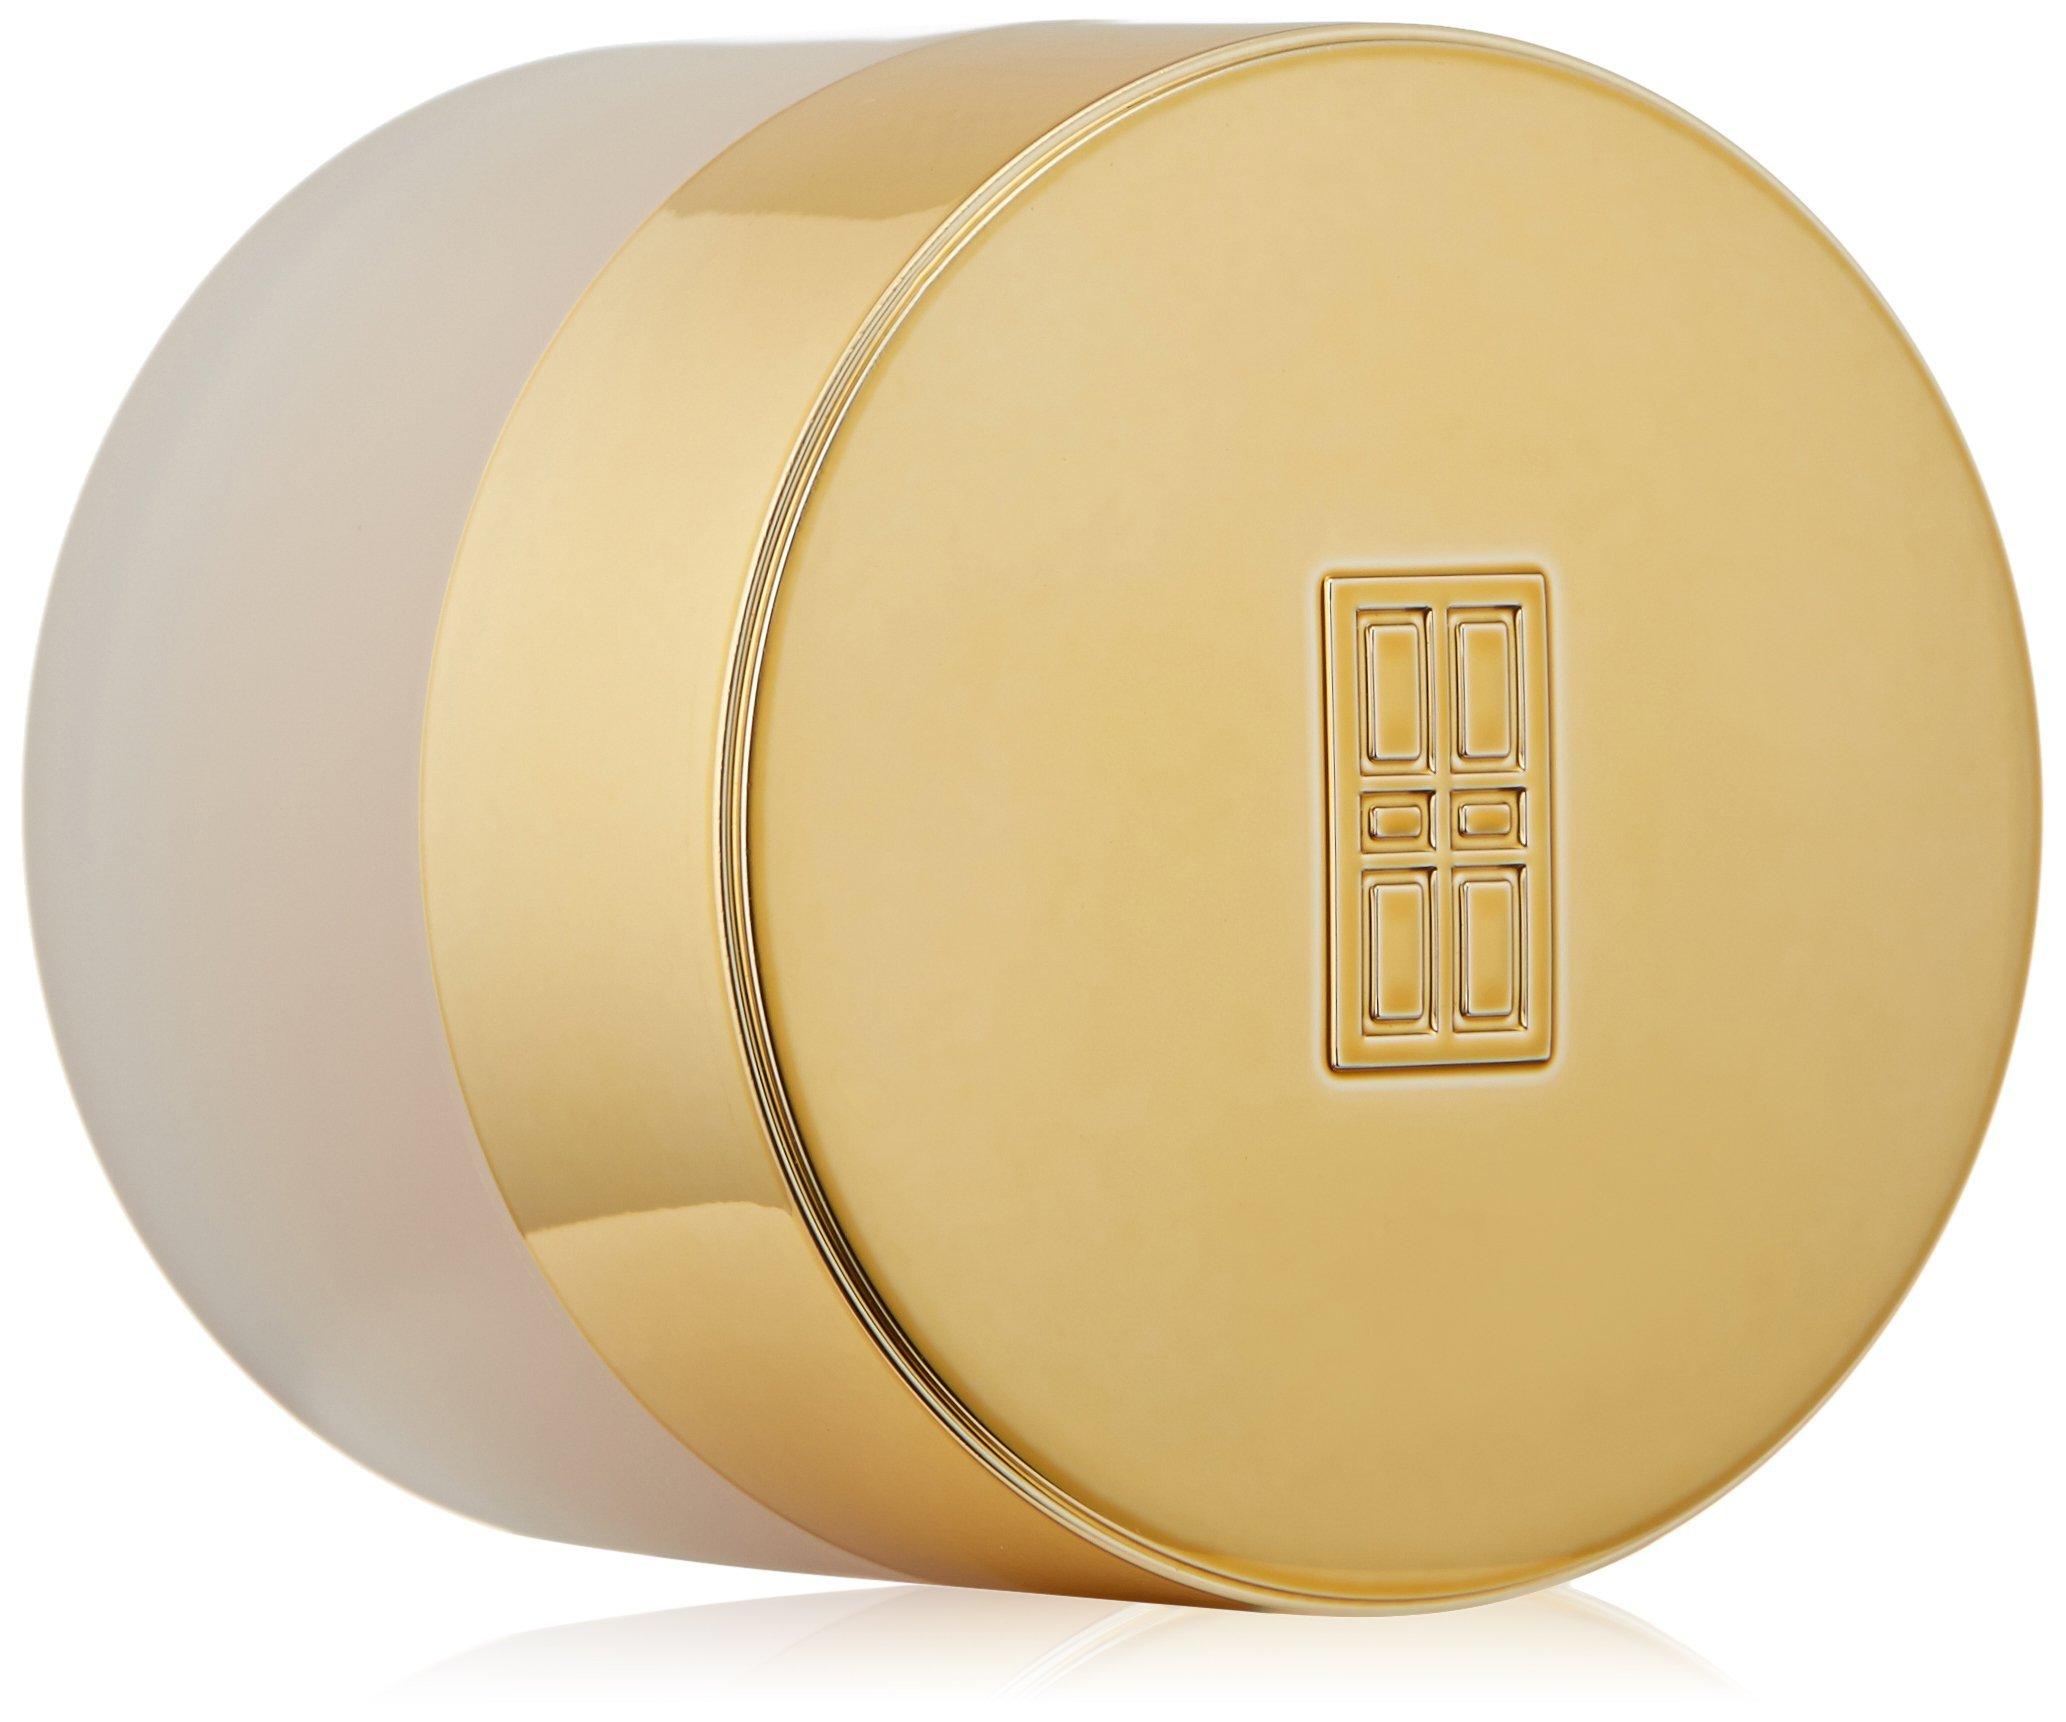 Elizabeth-Arden-Ceramide-Lift-Firm-Makeup-SPF-15-Broad-Spectrum-Sunscreen